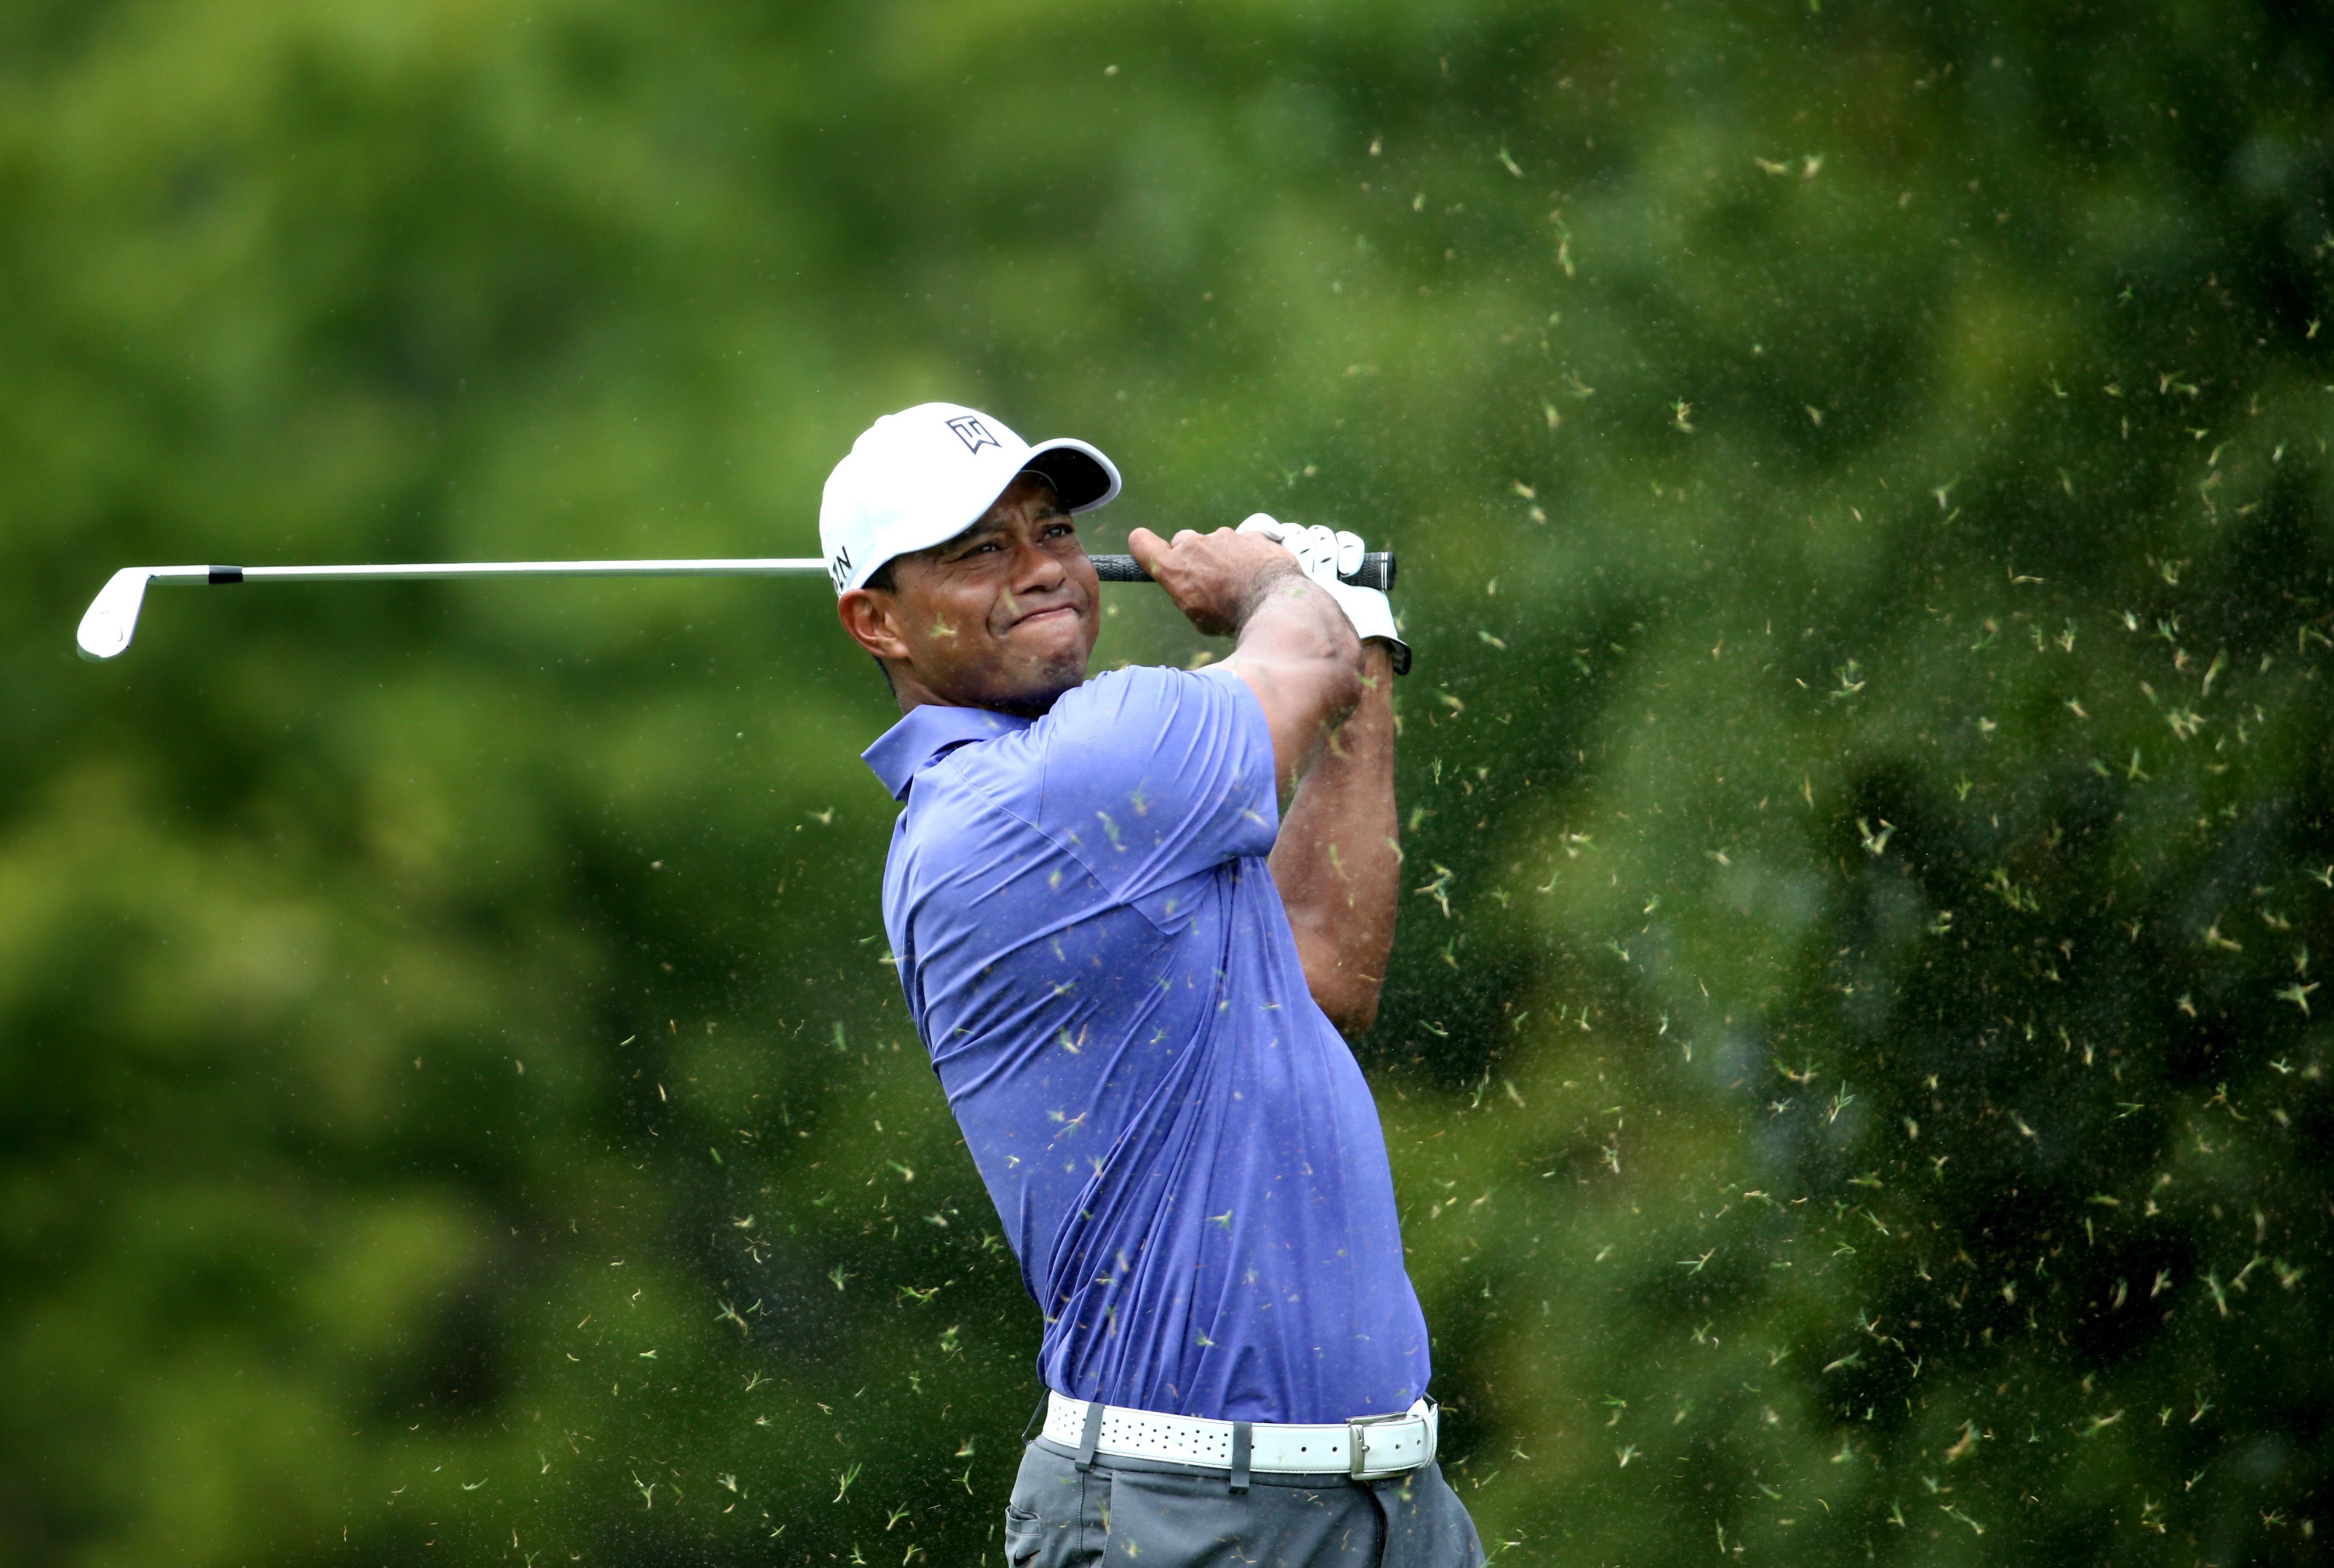 PGA Championship 2014 projected cut: Tiger Woods, Adam Scott near the cut line